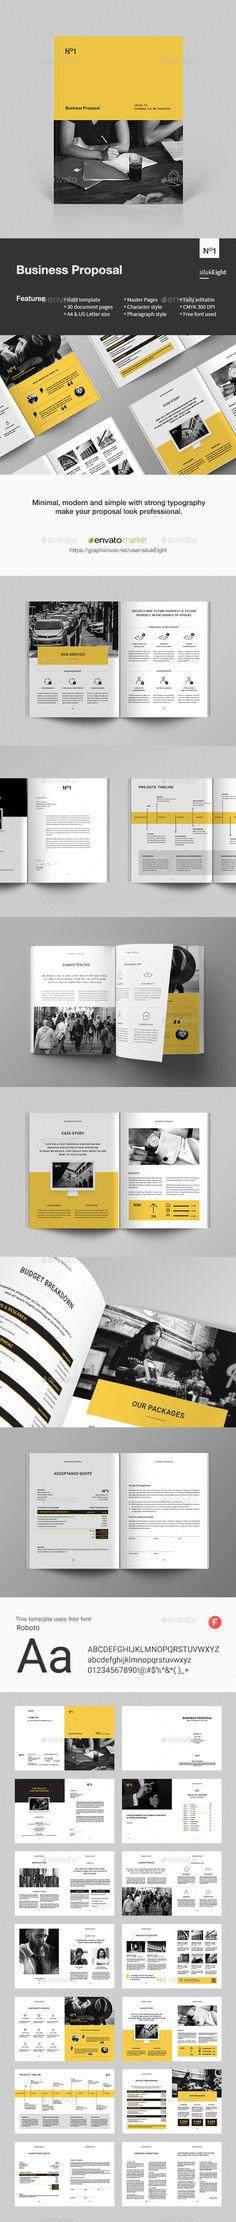 #Business Proposal - #Corporate #Brochures